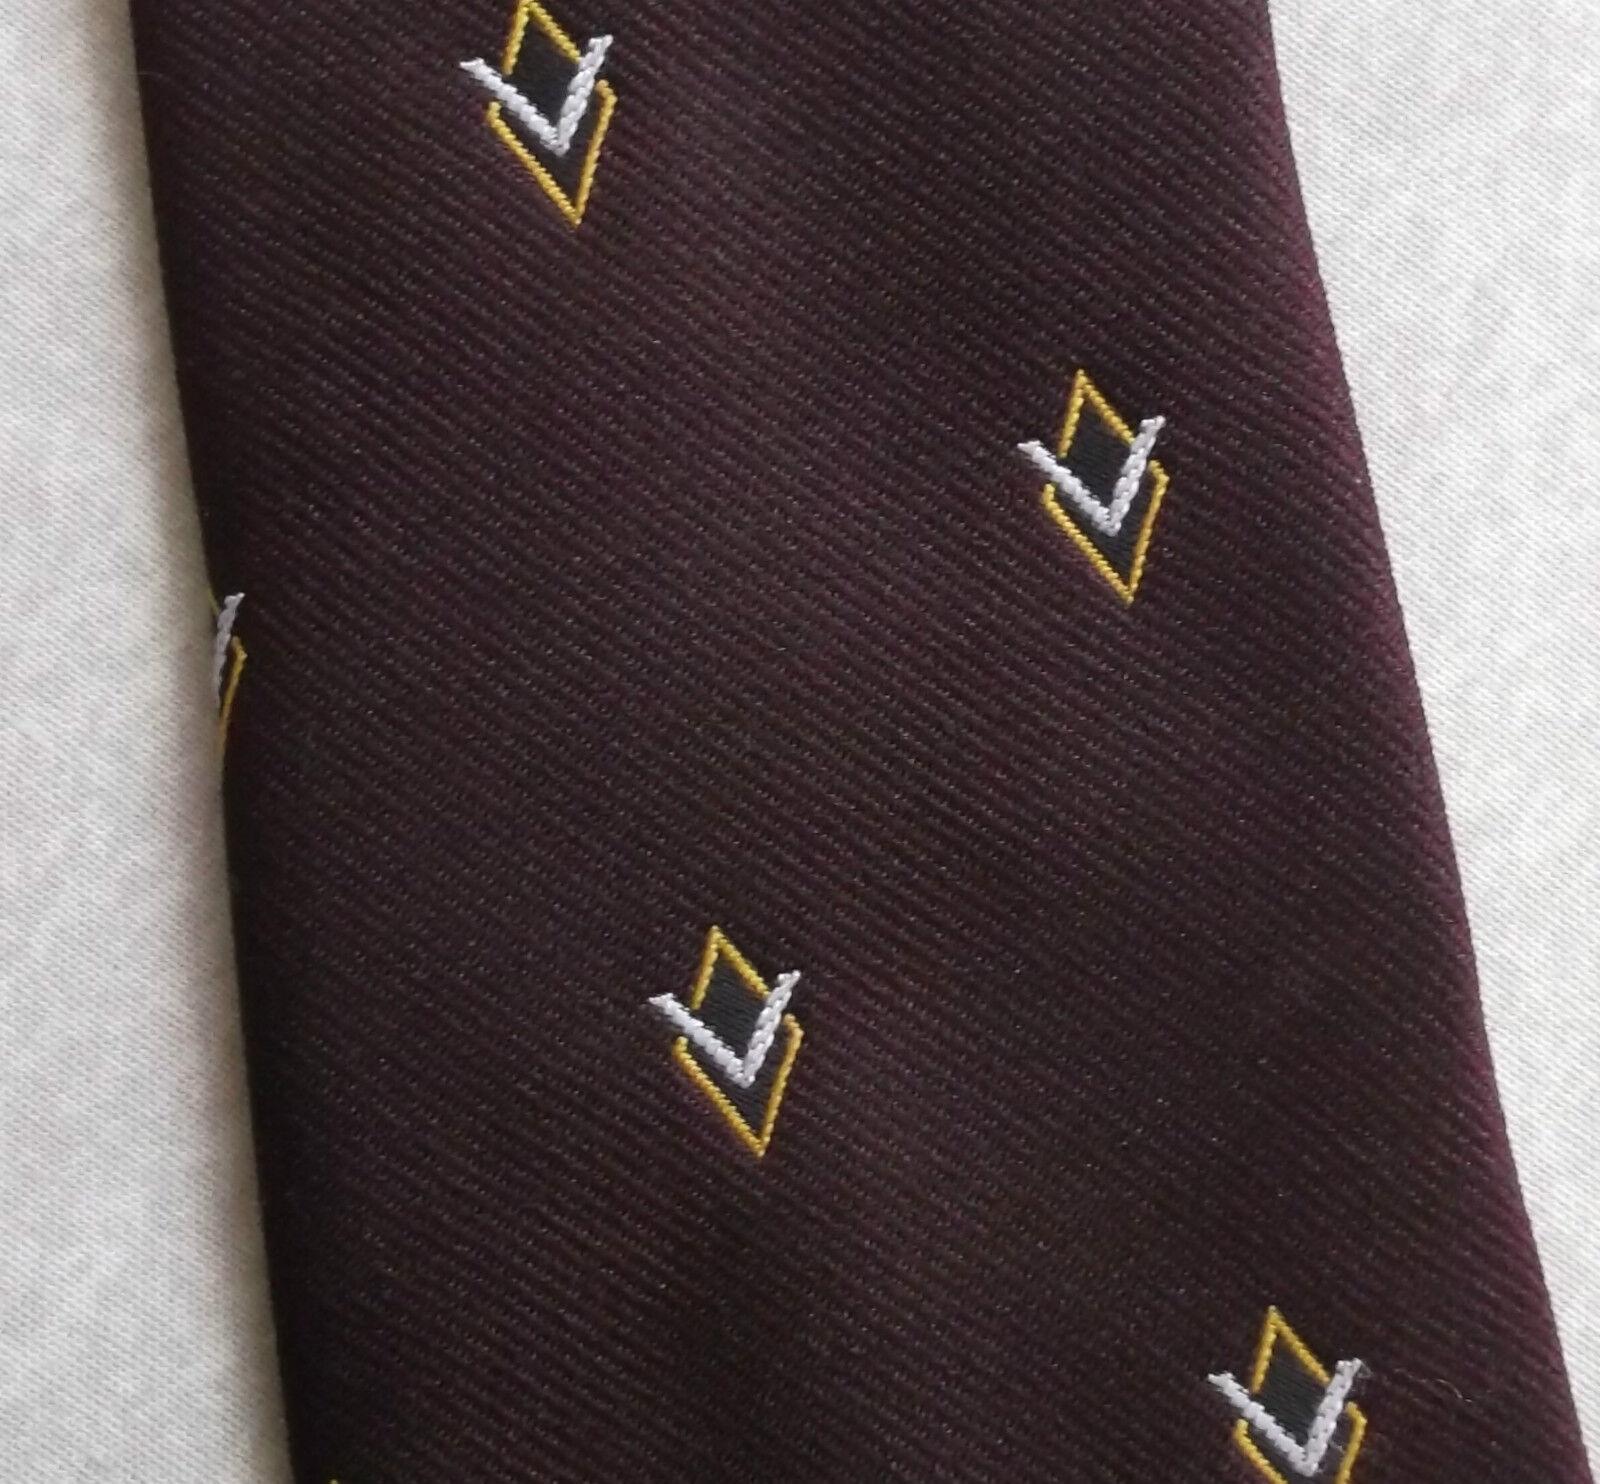 Vintage Tie MENS Necktie Company Logo Crested Club Association Society